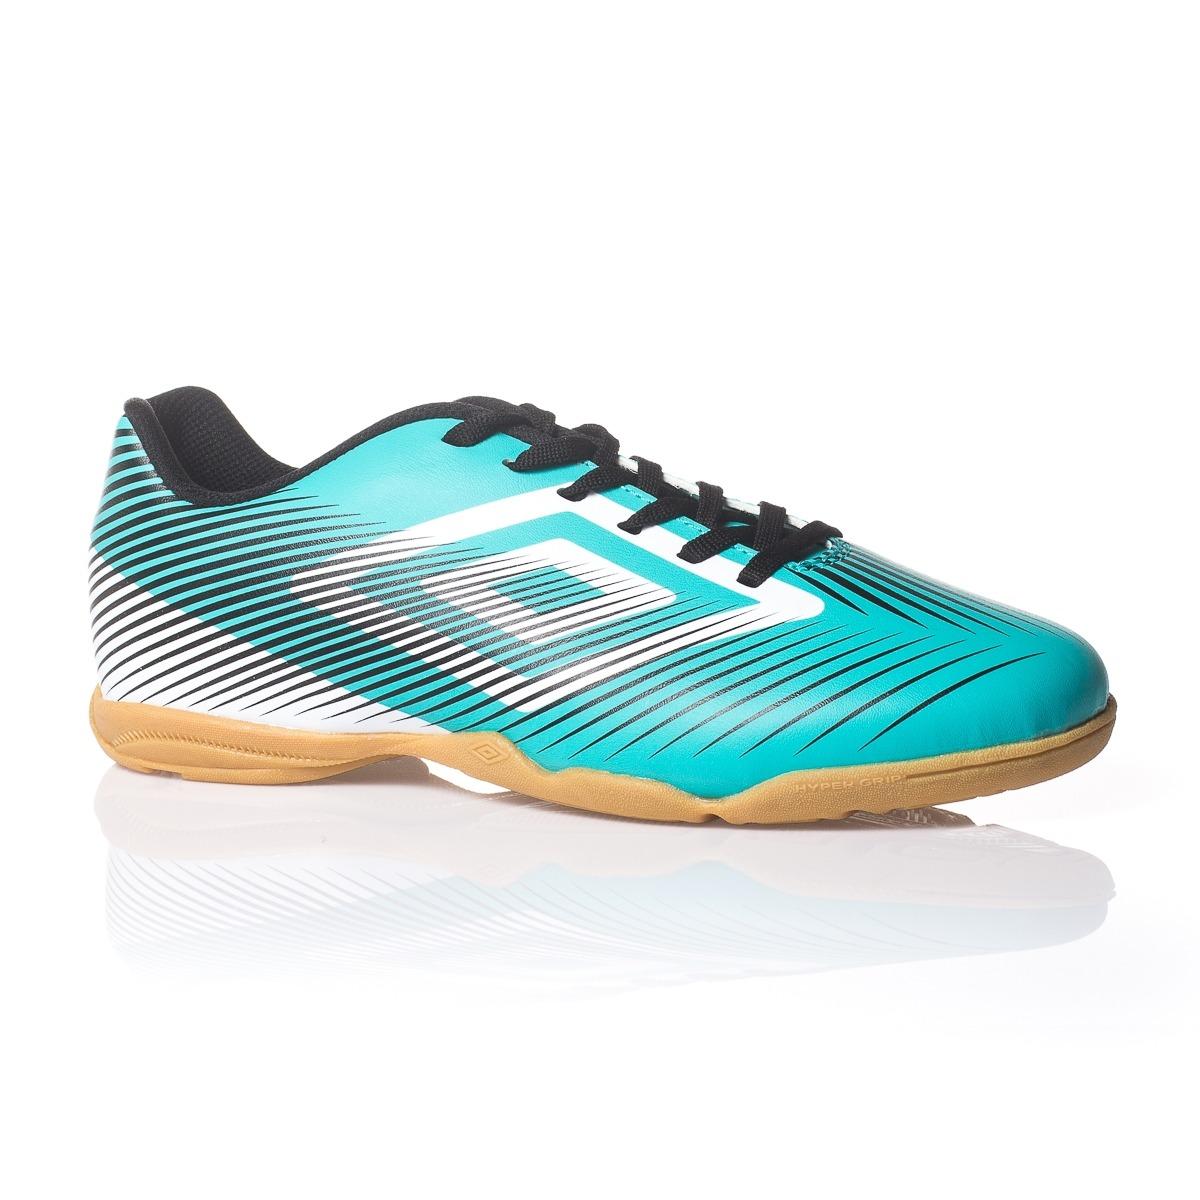 ae3e1df9aa Tênis Masculino Futsal Umbro Indoor Speed Verde 0f72049 - R  120